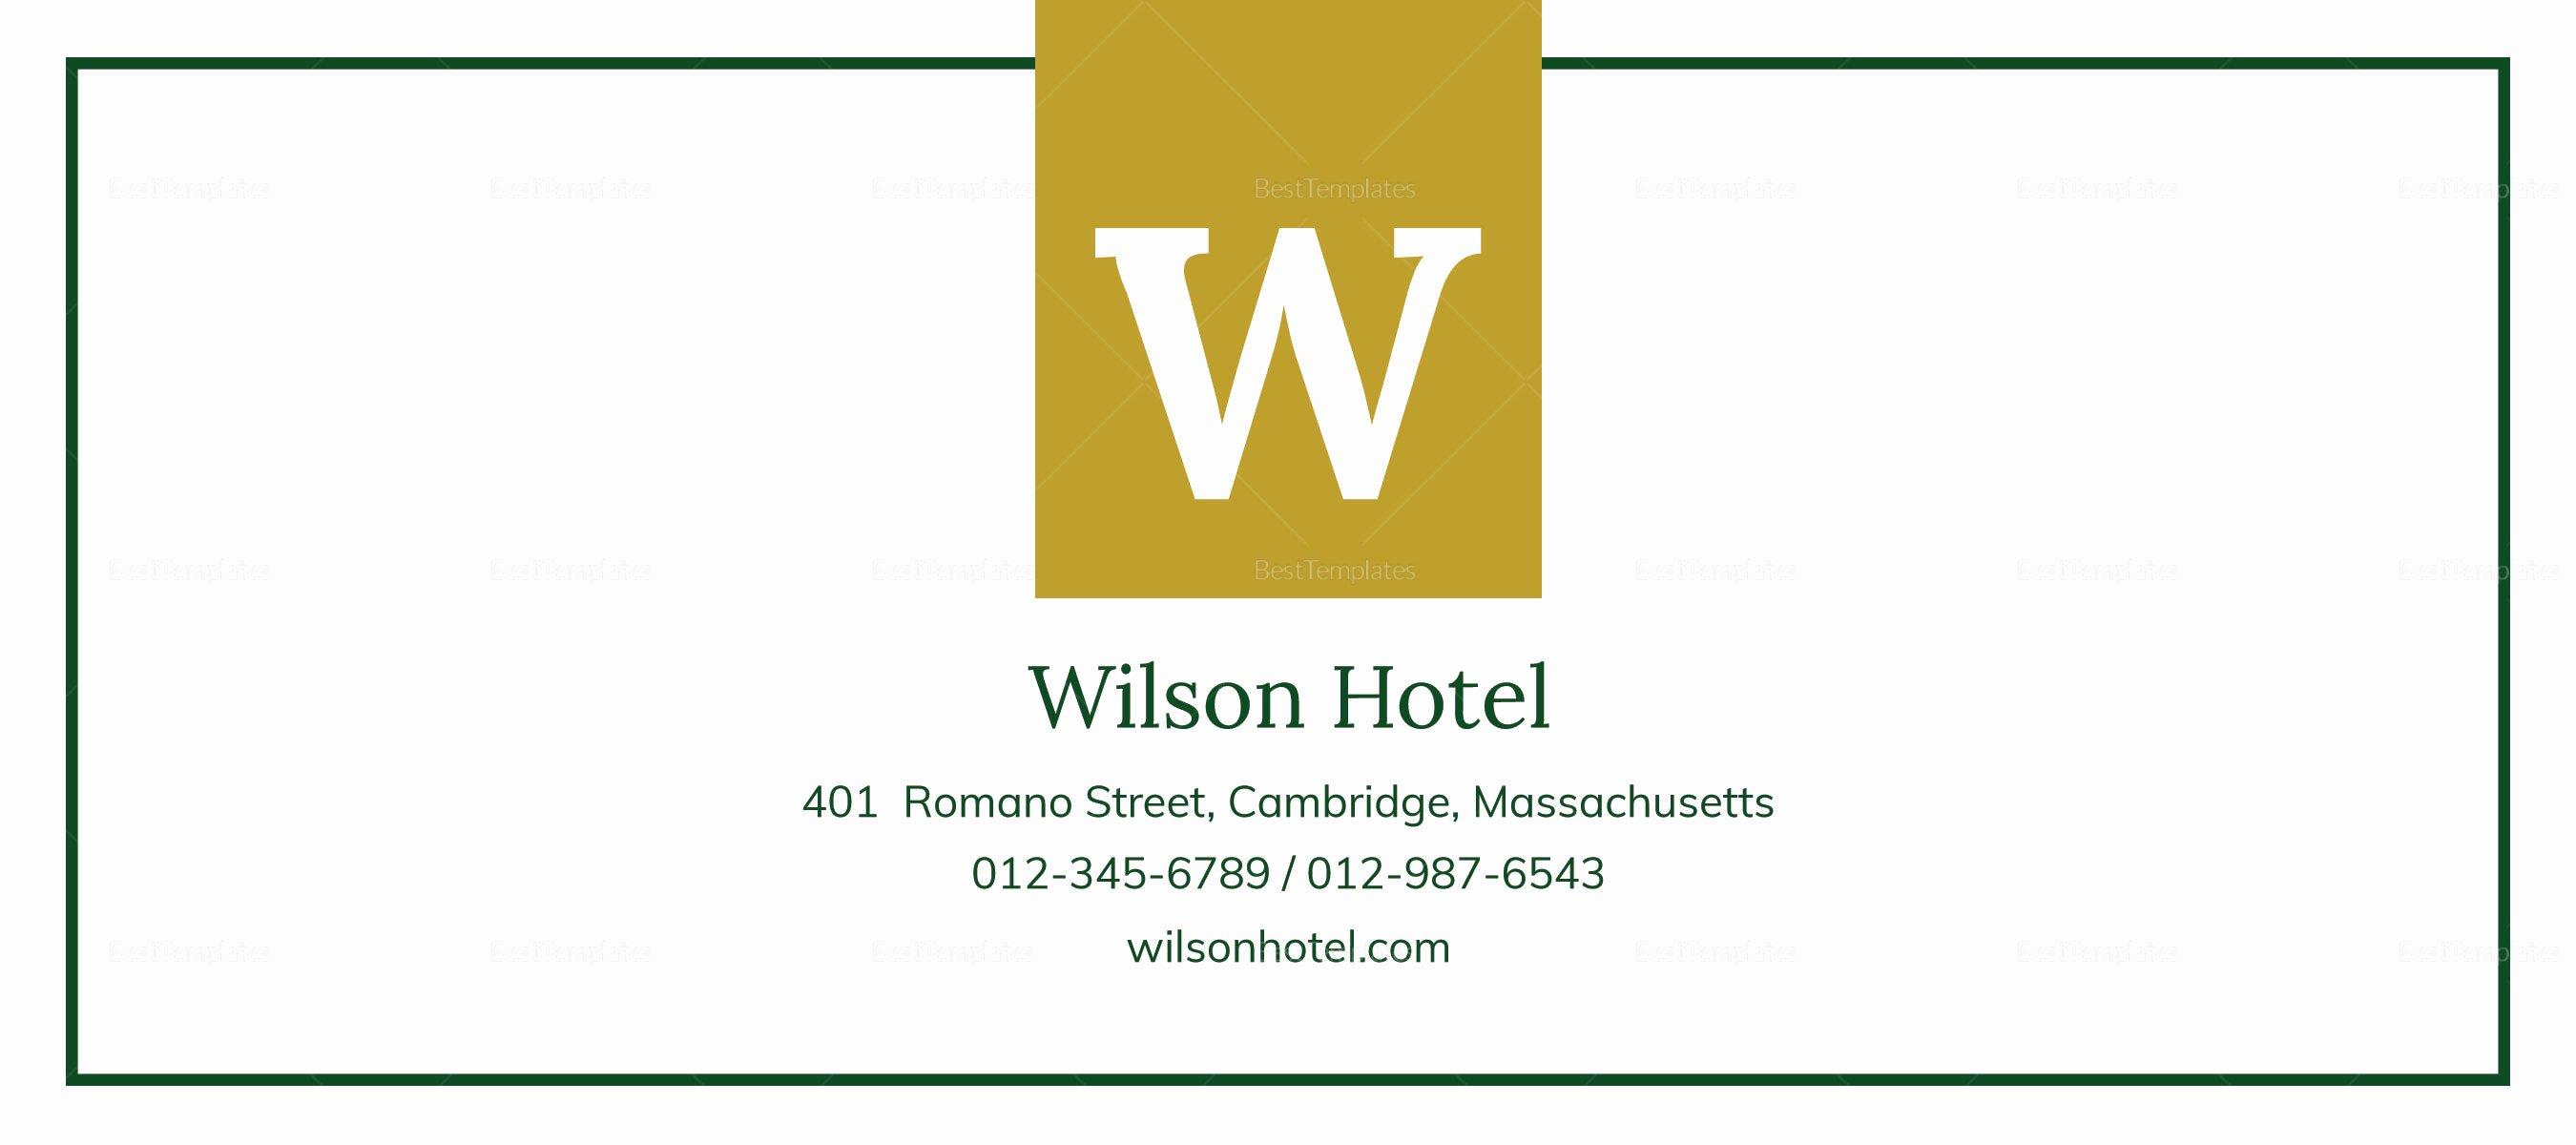 Hotel Gift Certificate Template Elegant Hotel Gift Certificate Design Template In Psd Word